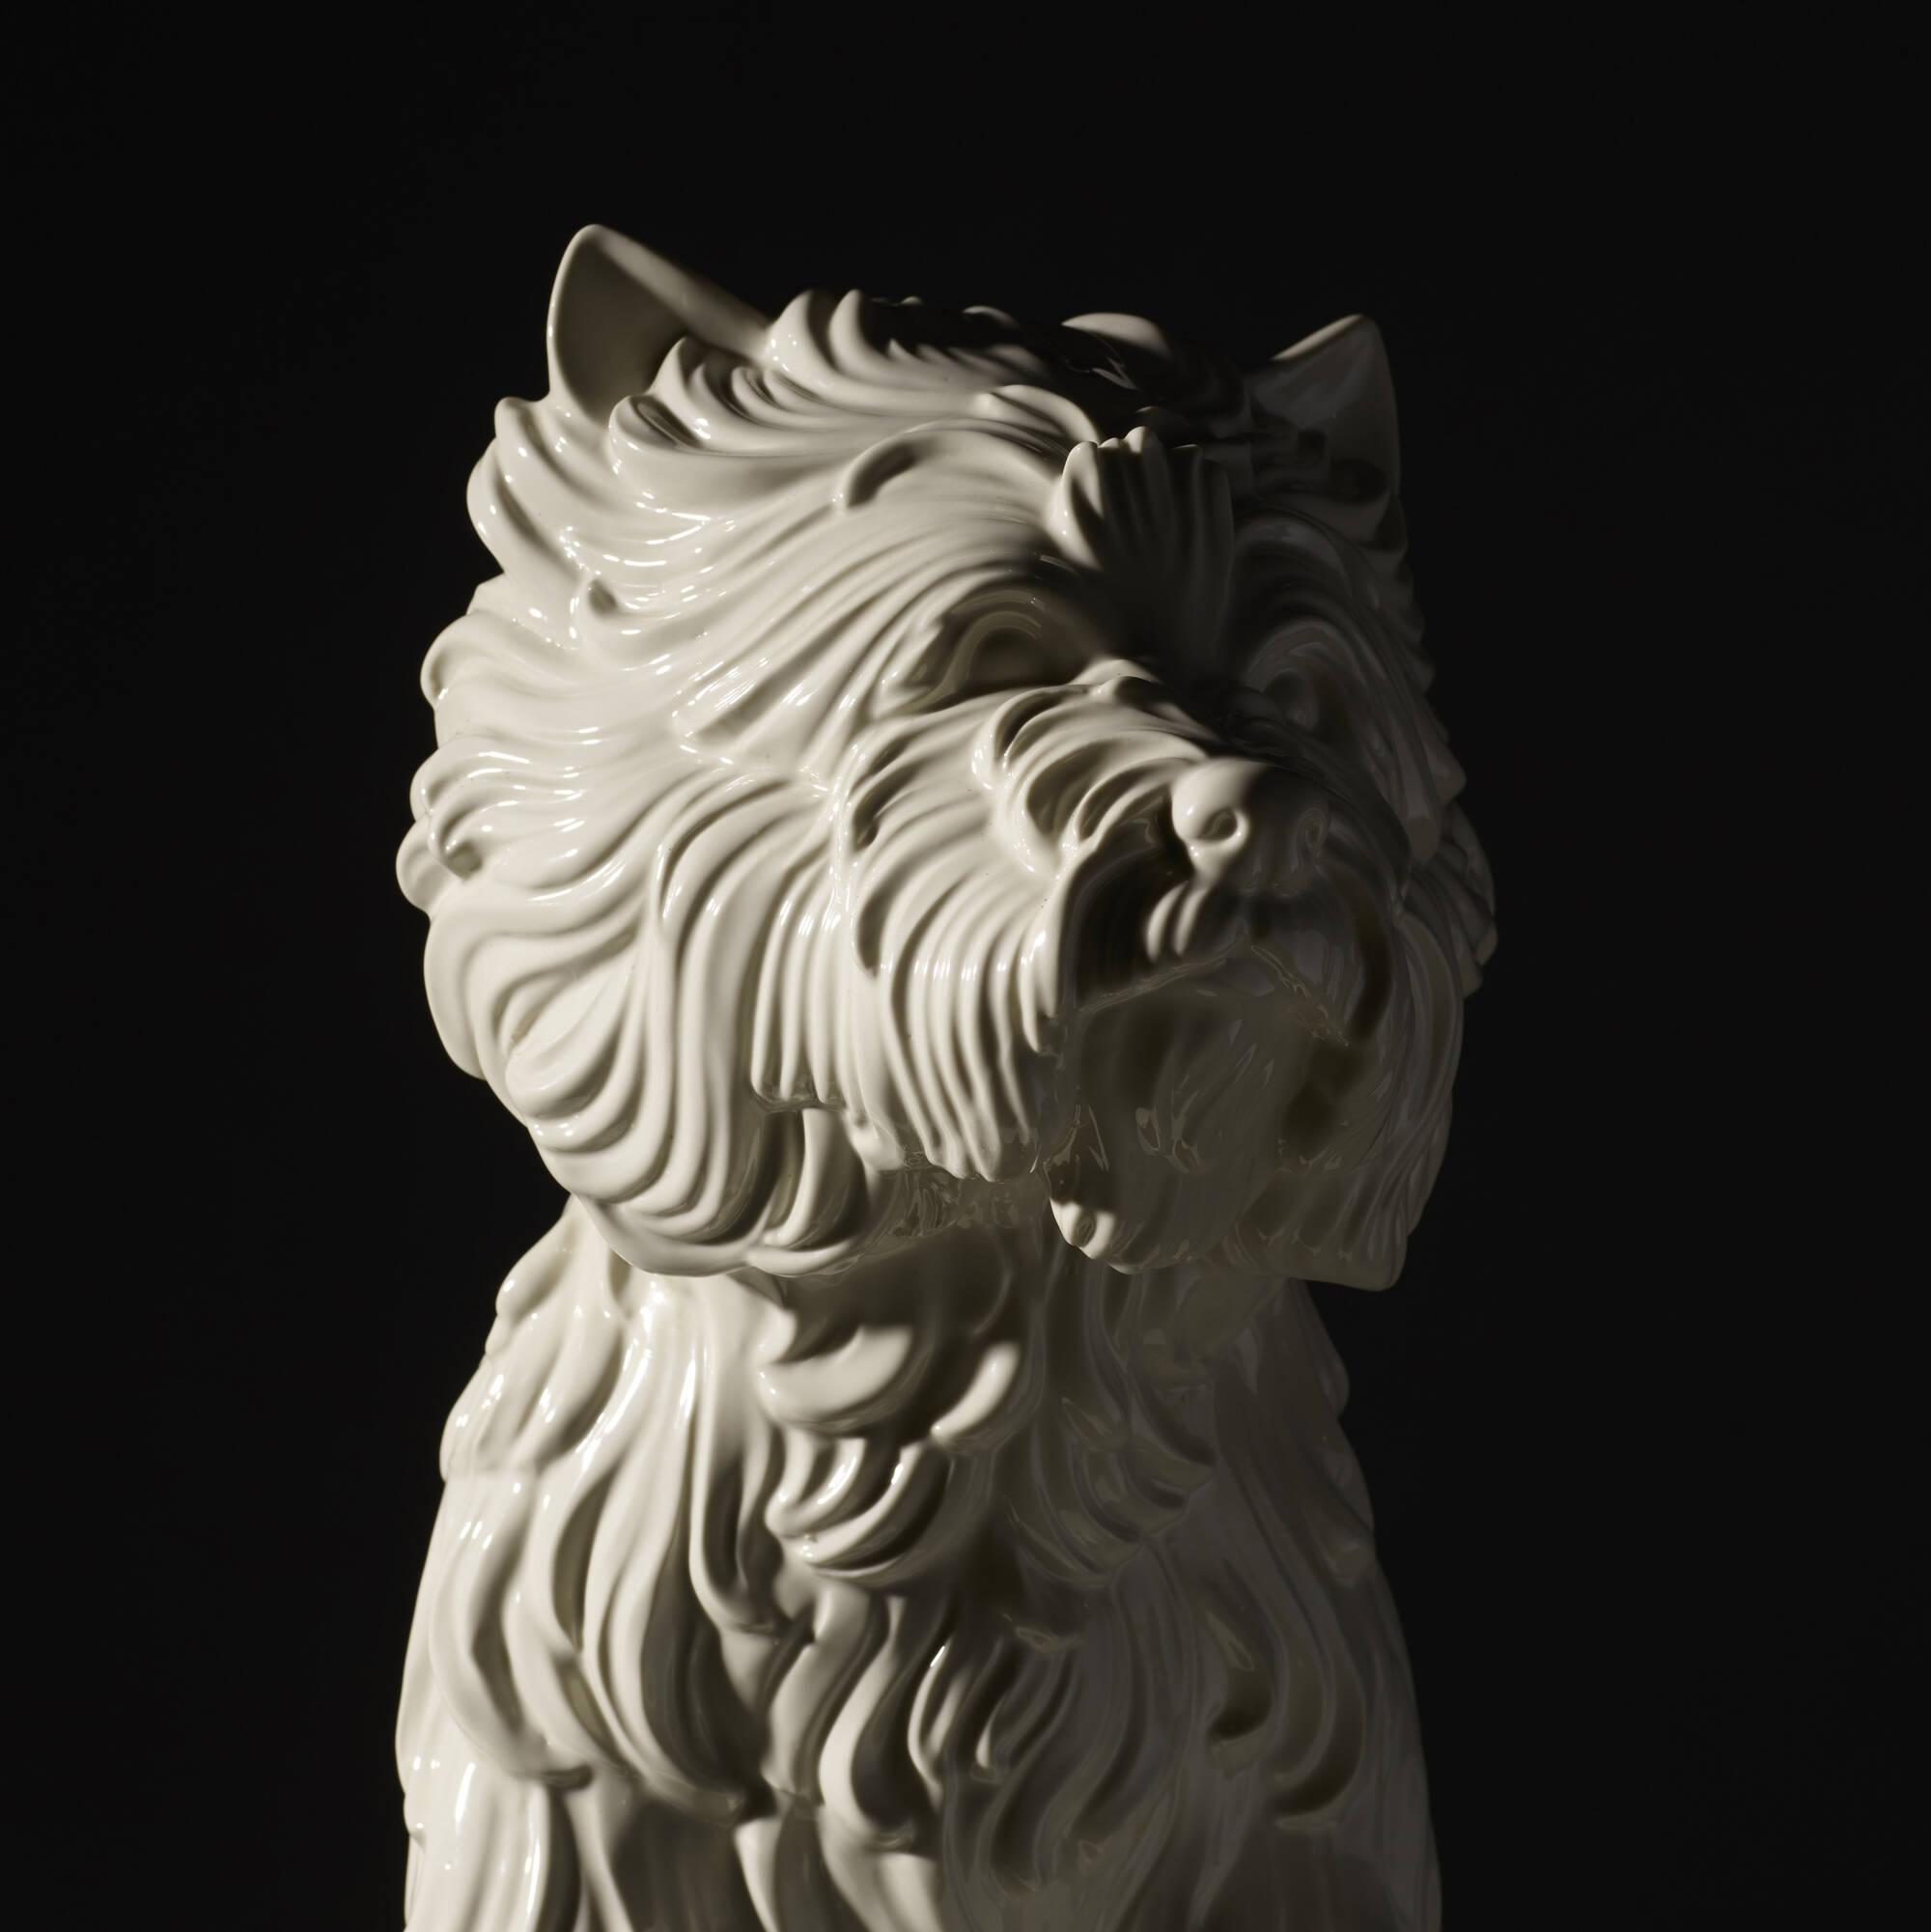 228: Jeff Koons / Puppy (vase) (3 of 3)